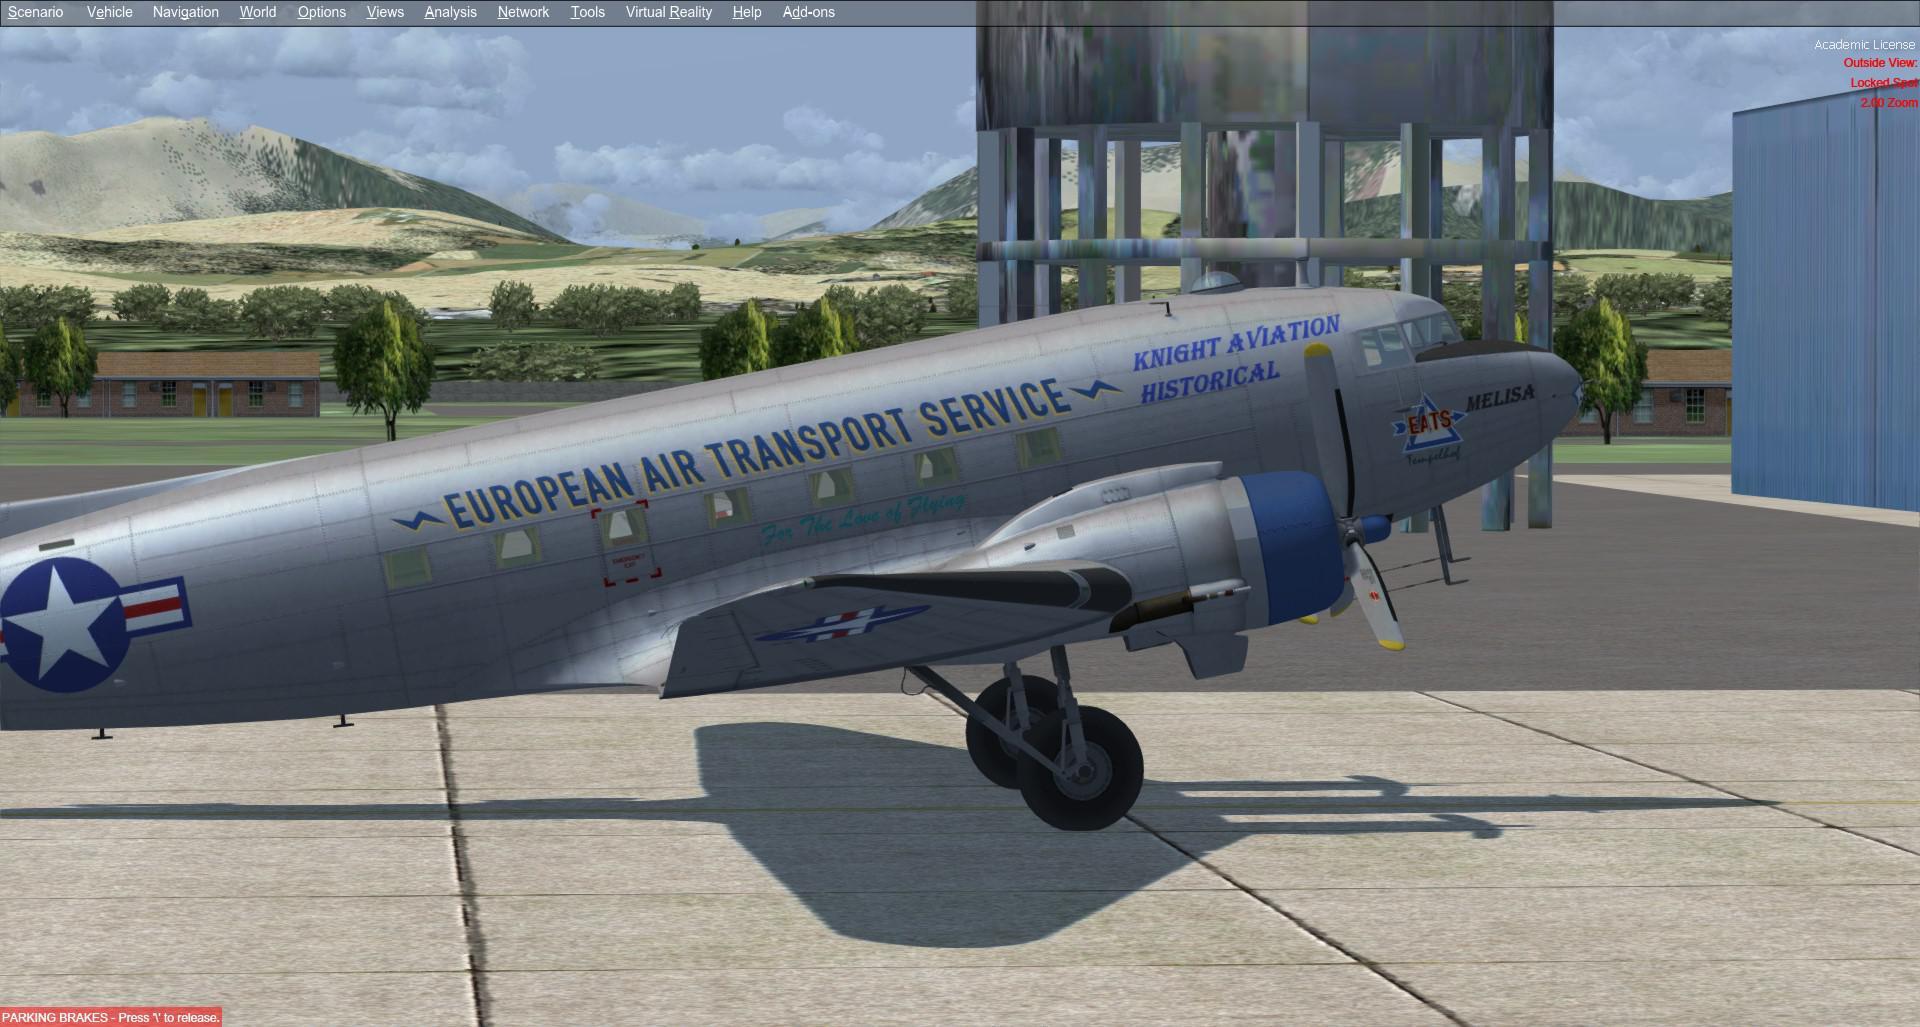 Knight Aviation Historical